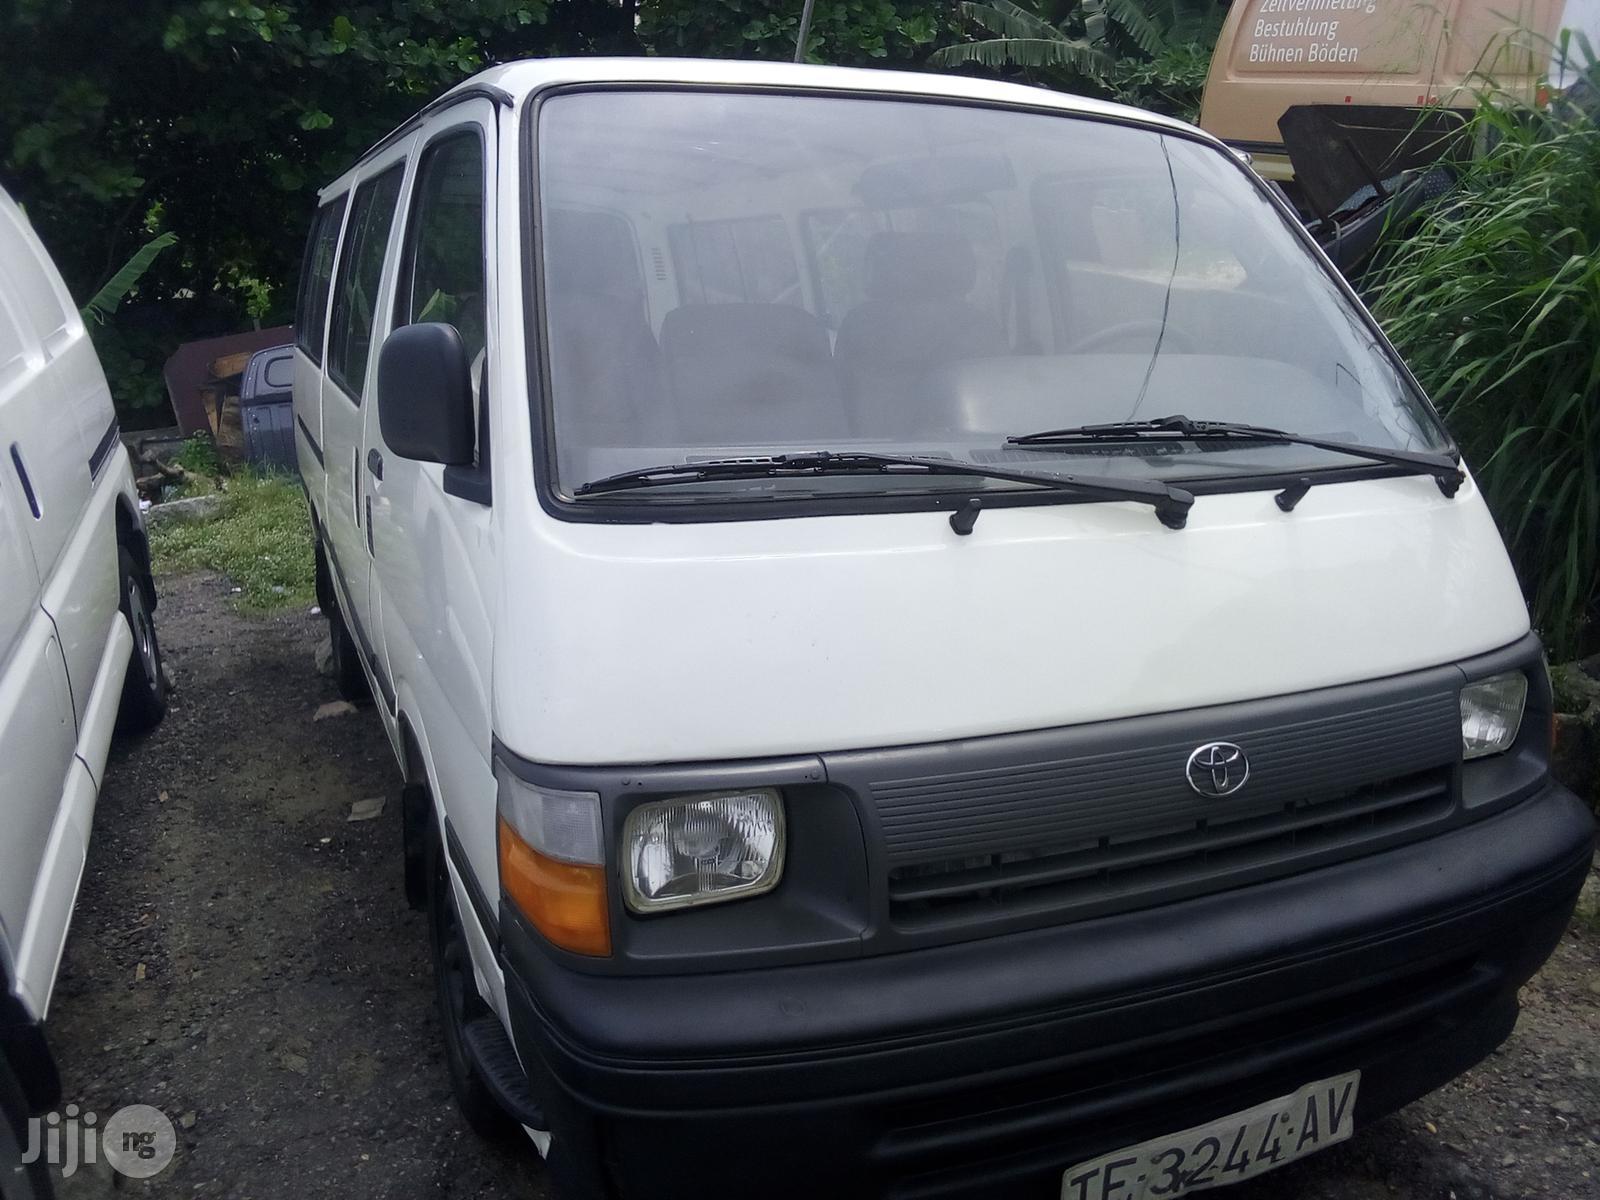 Toyota Hiace 1995 White | Buses & Microbuses for sale in Apapa, Lagos State, Nigeria